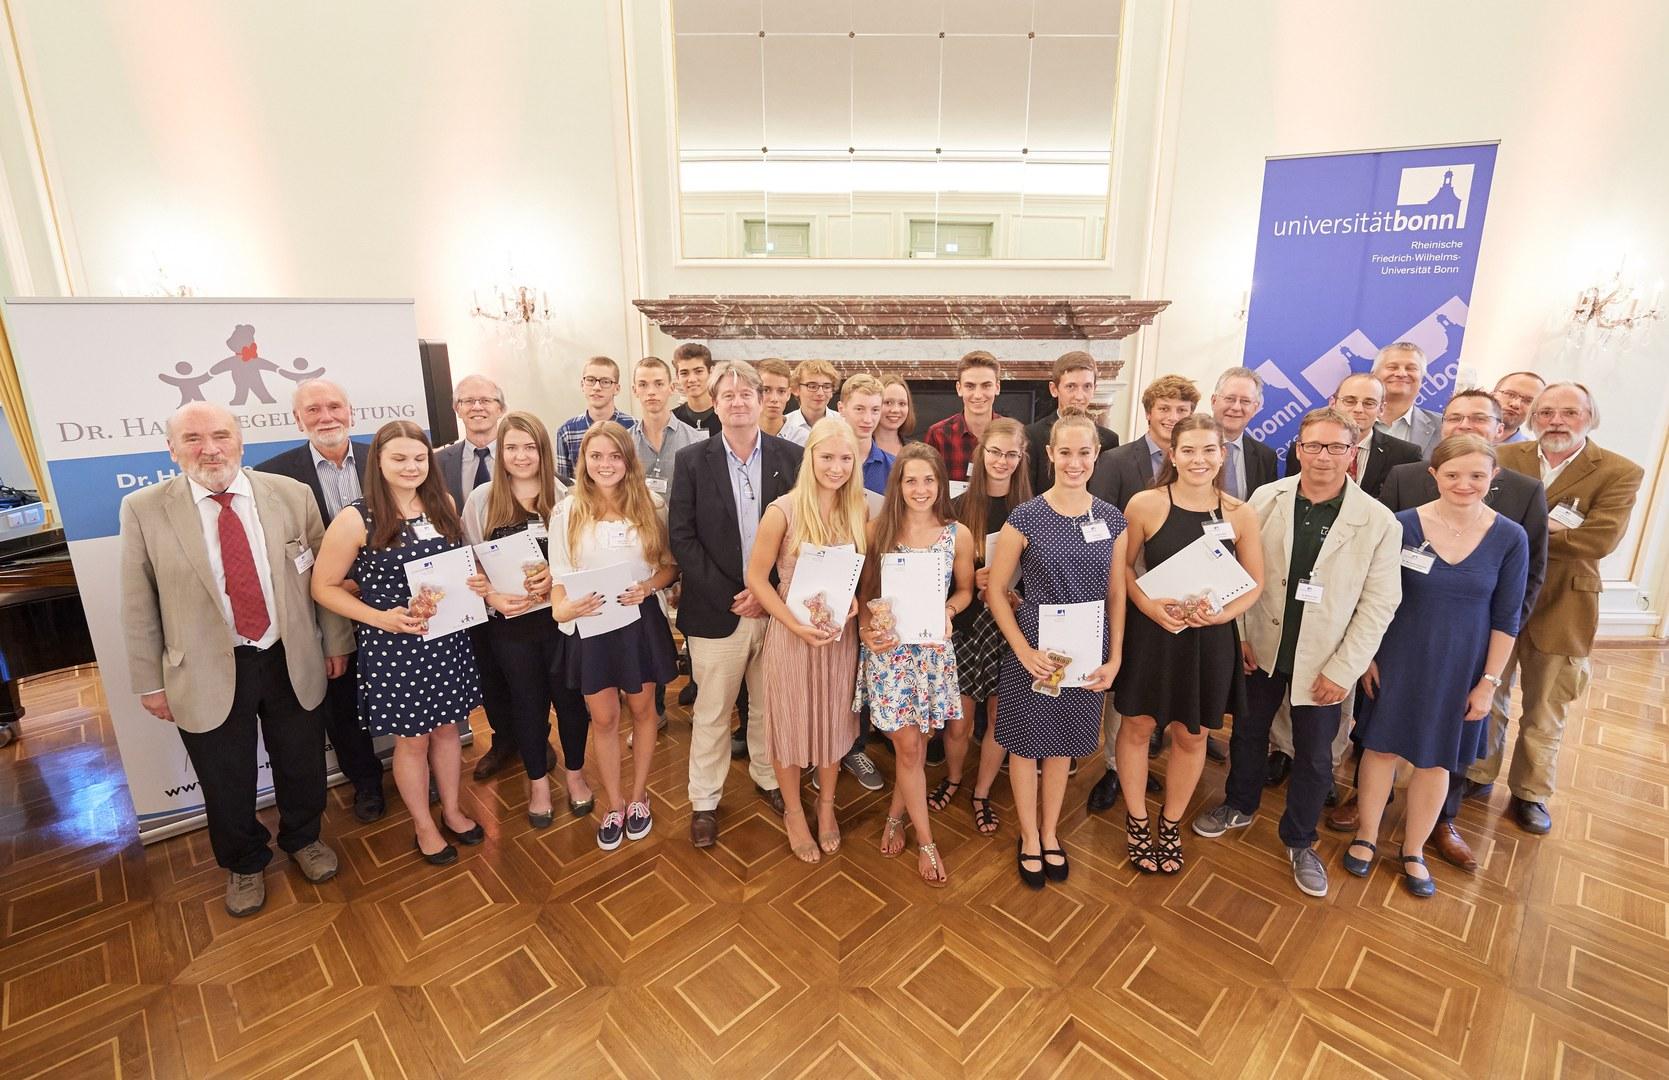 Verleihung der Dr. Hans Riegel-Fachpreise an der Universität Bonn: